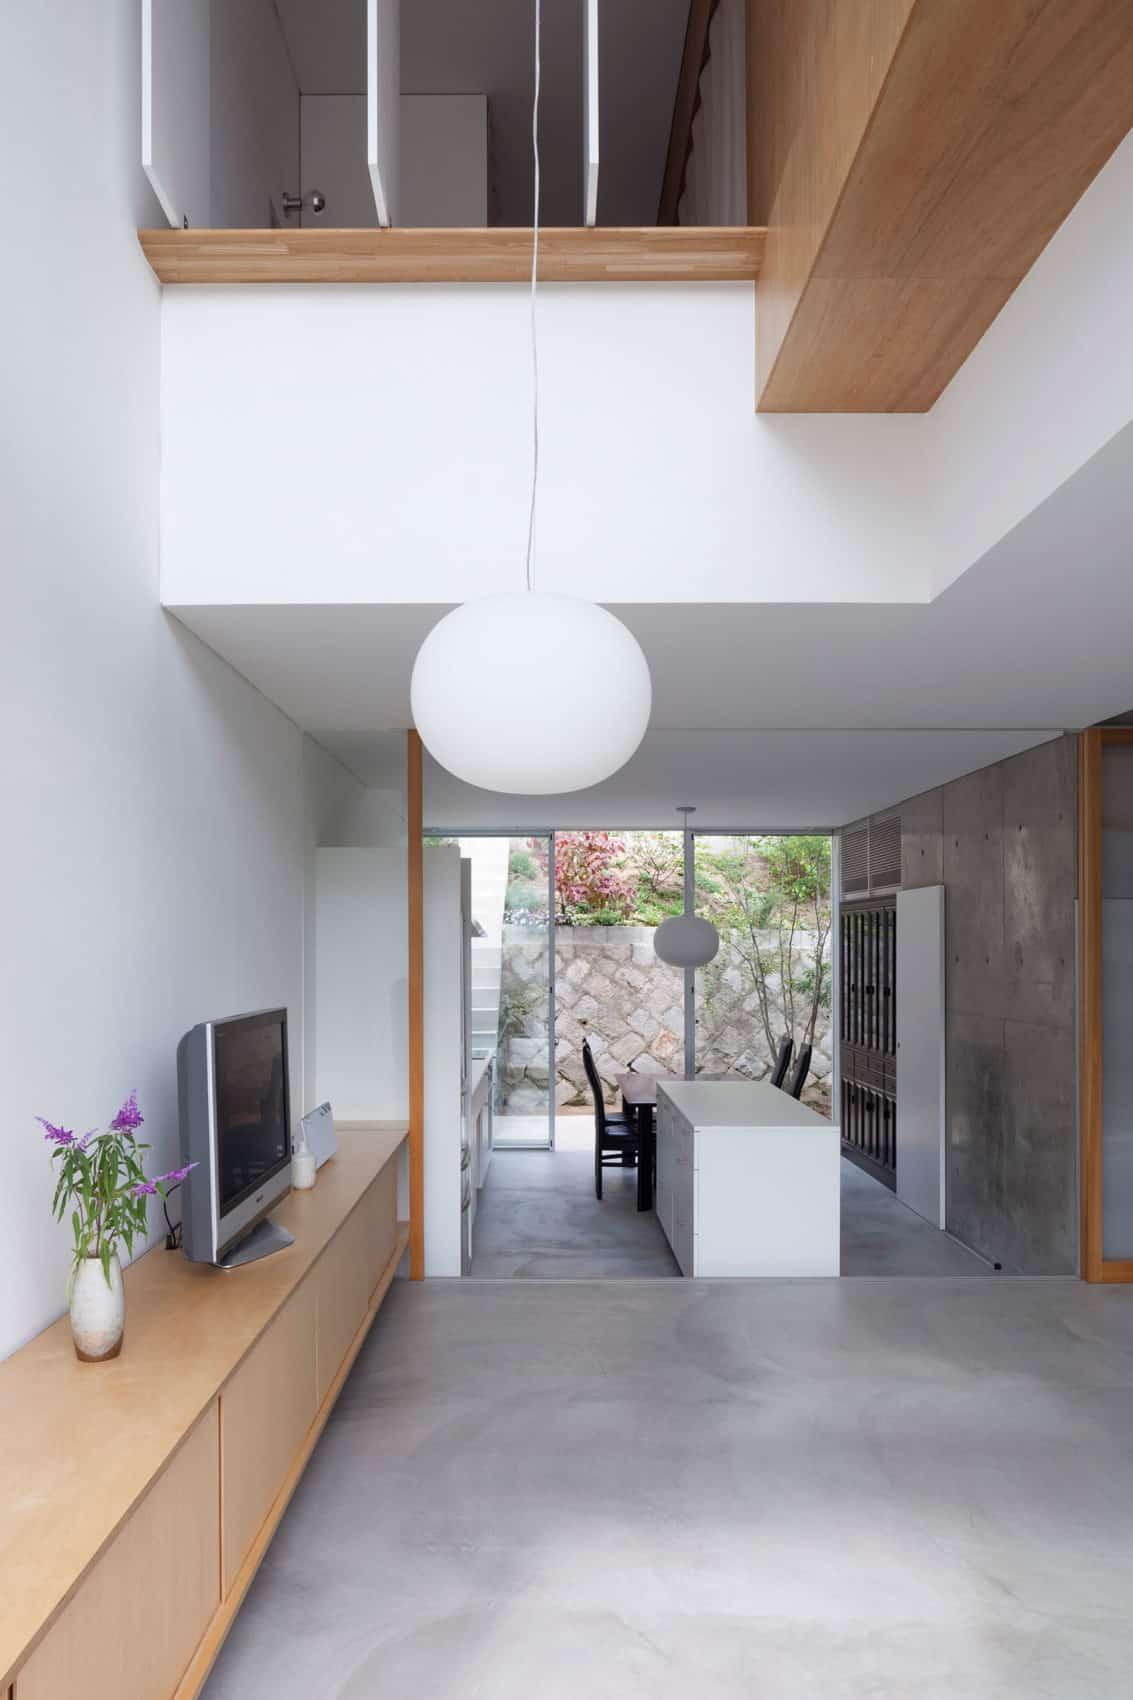 House in Midorigaoka by Yutaka Yoshida Architect (8)